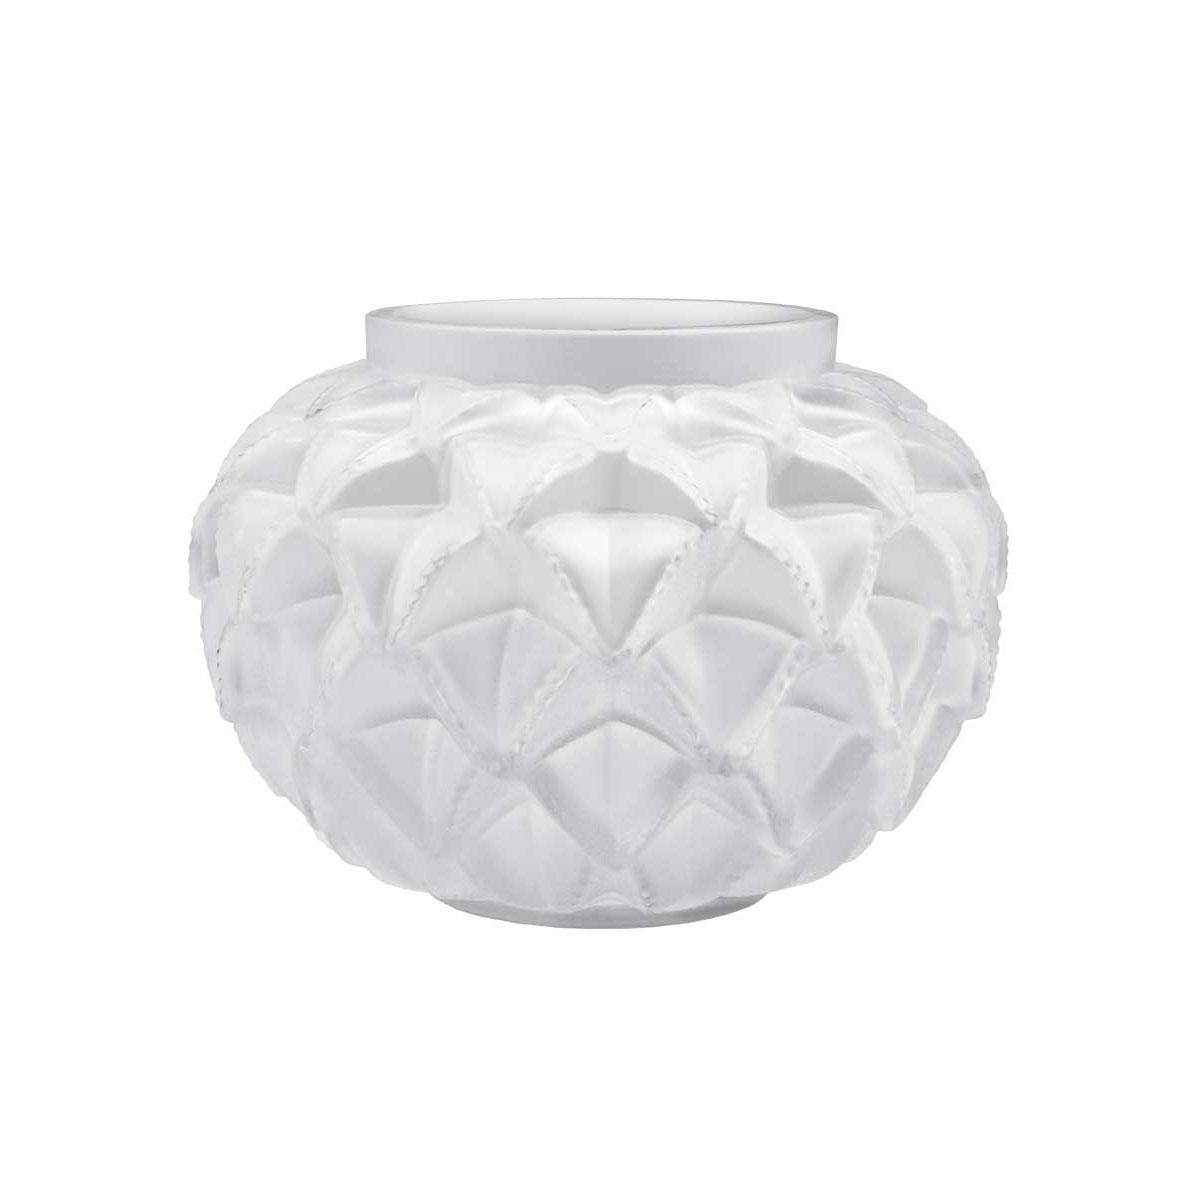 "Lalique Crystal, Languedoc 8 7/16"" Crystal Vase, Clear"